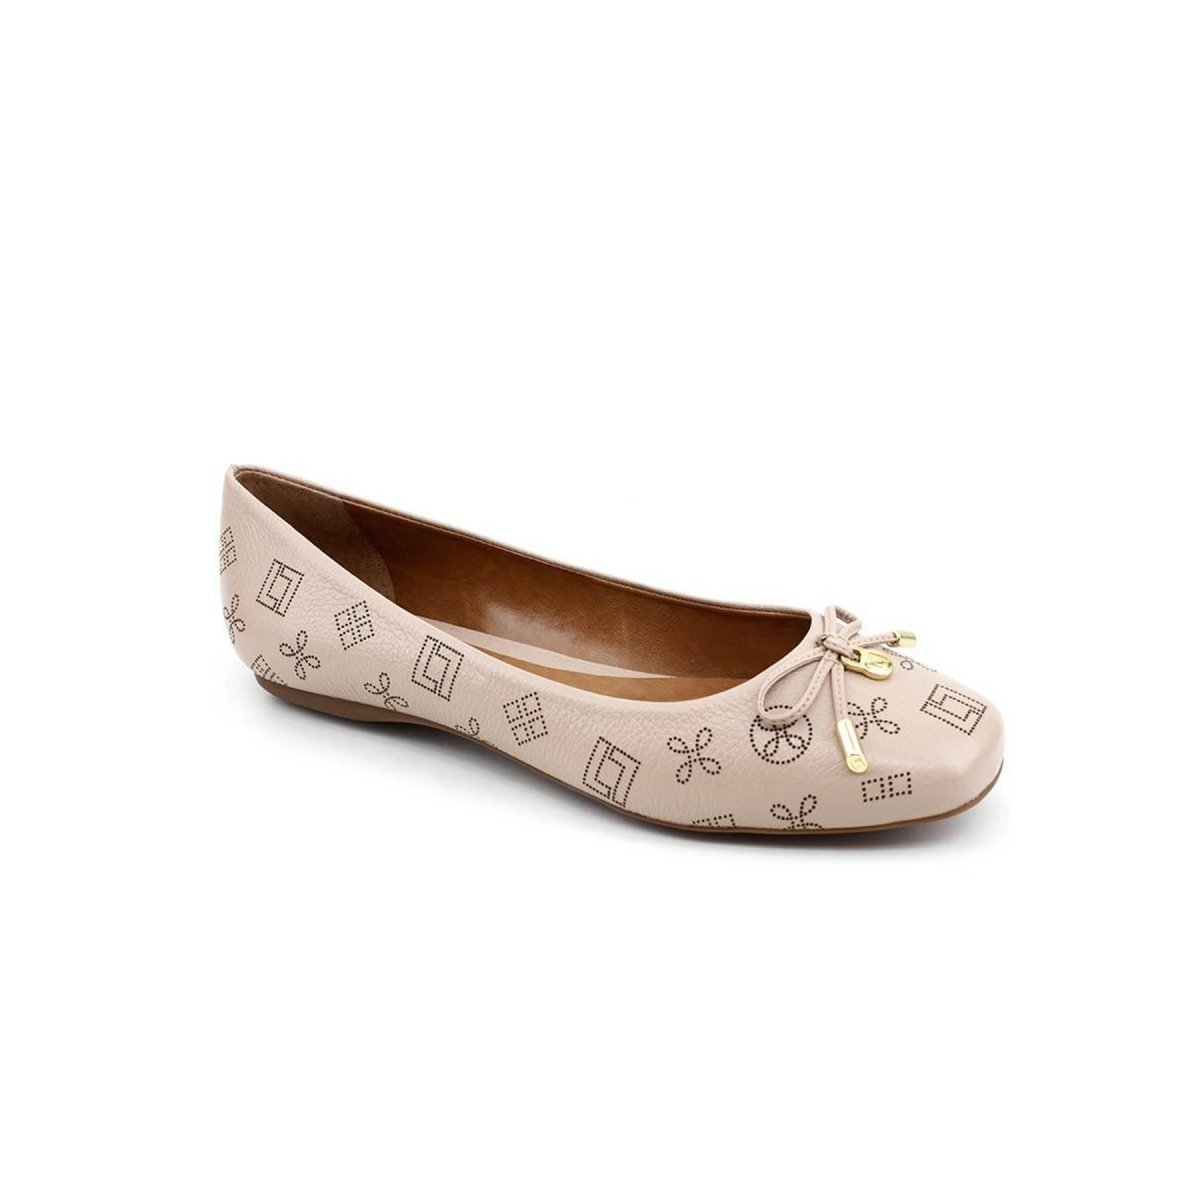 12b80d04c Sapatilha Estampada Luz da Lua | G&Co Shoes